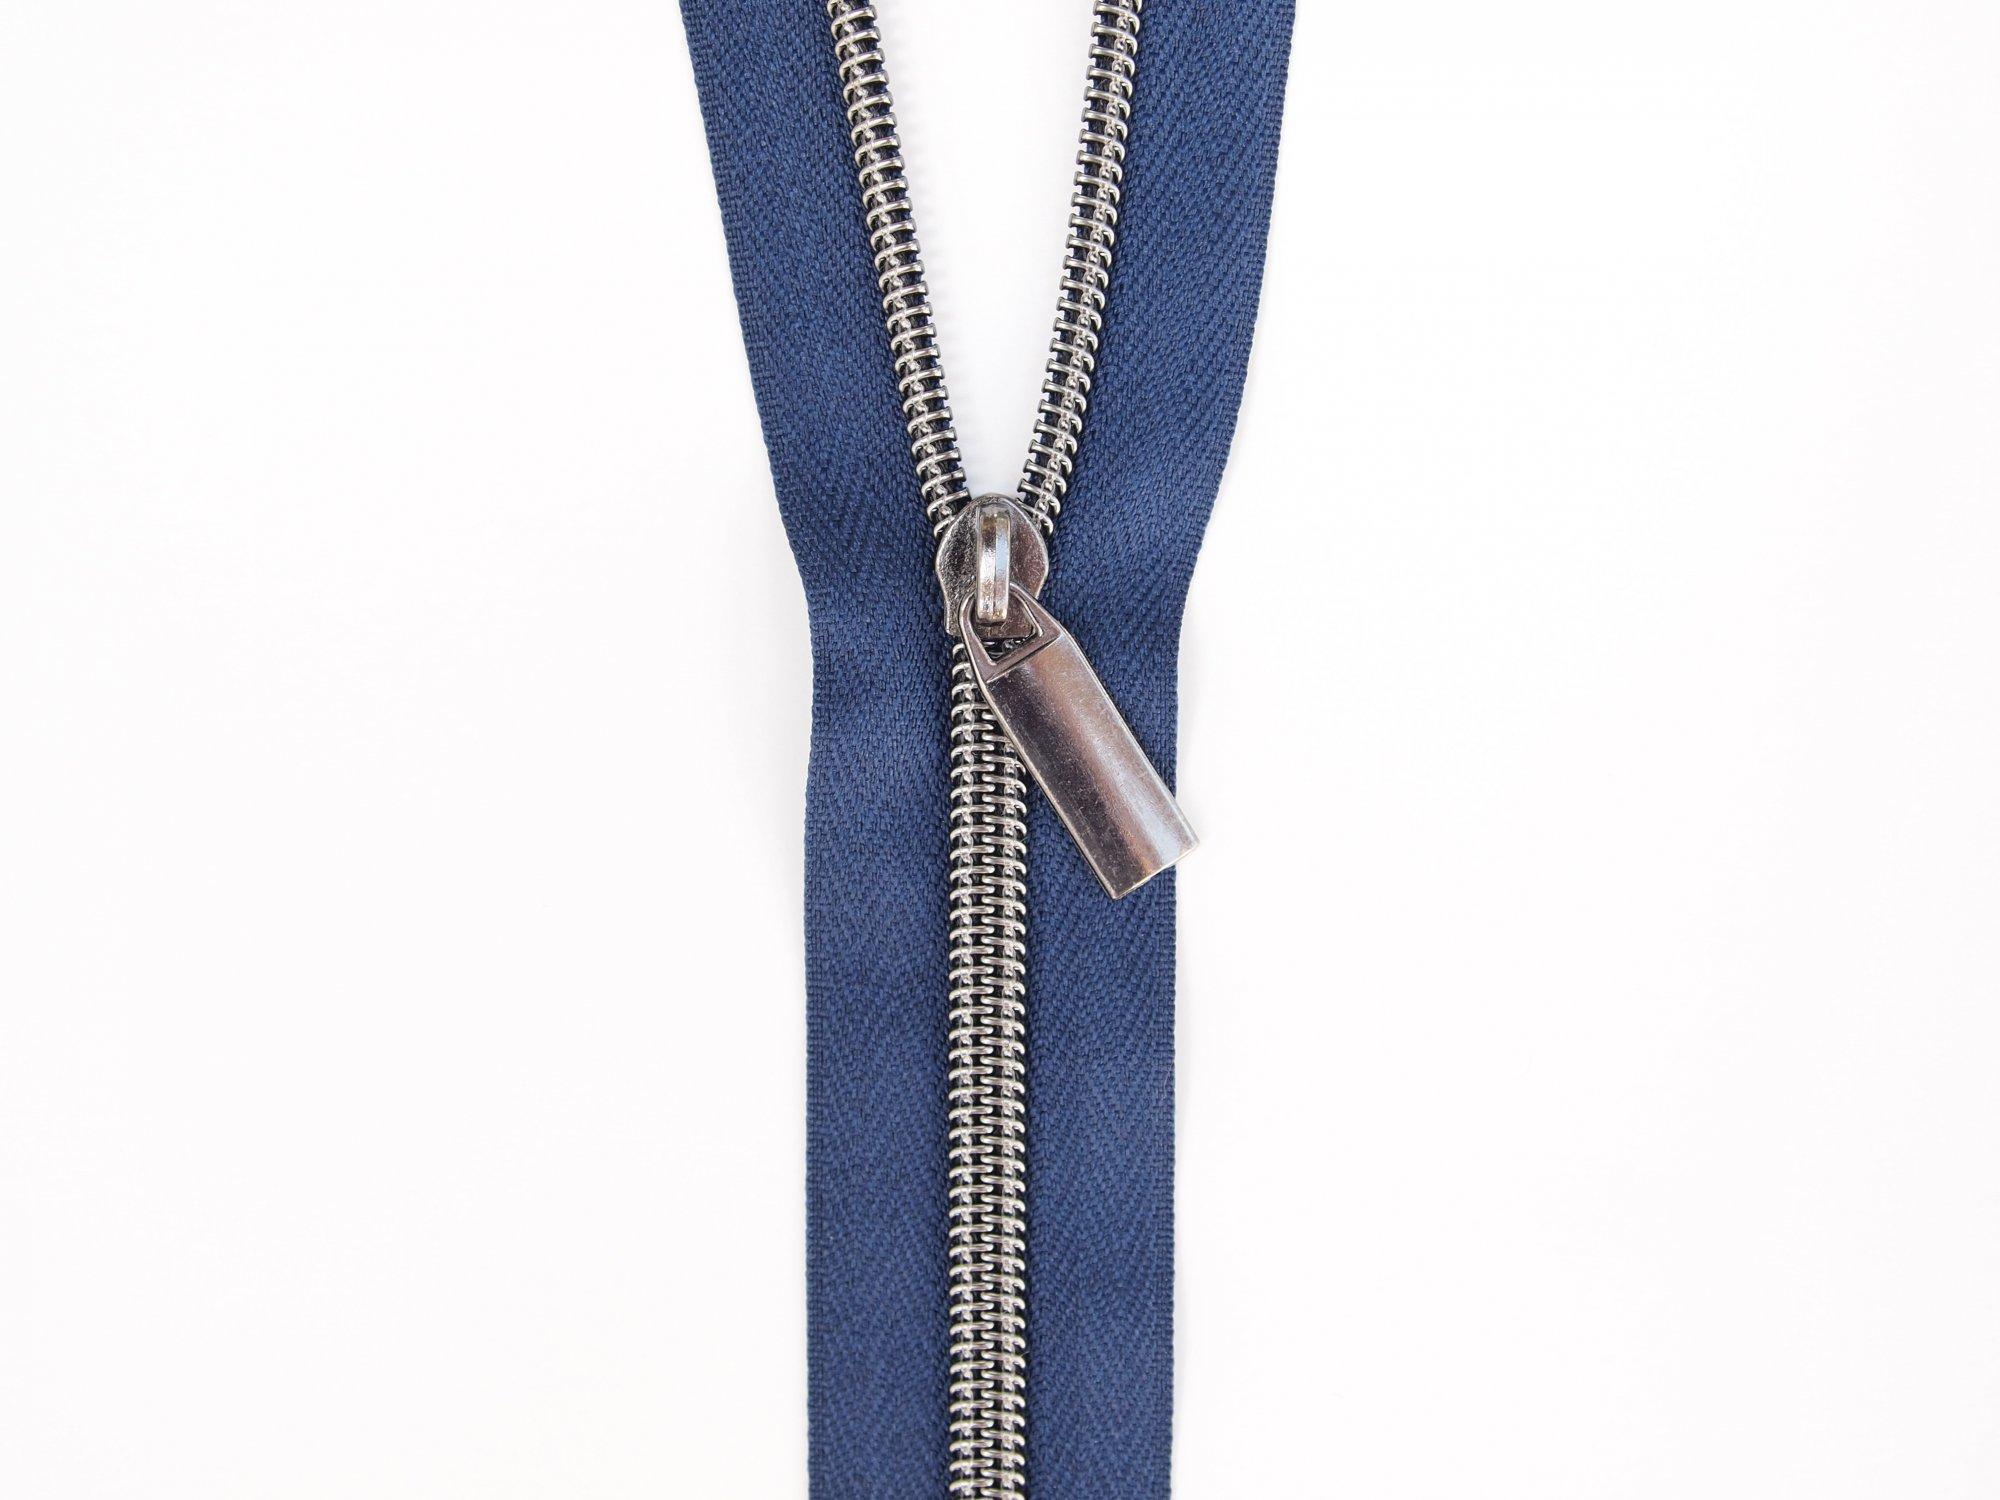 Zipper Tape - Navy Tape & Gunmetal Zipper